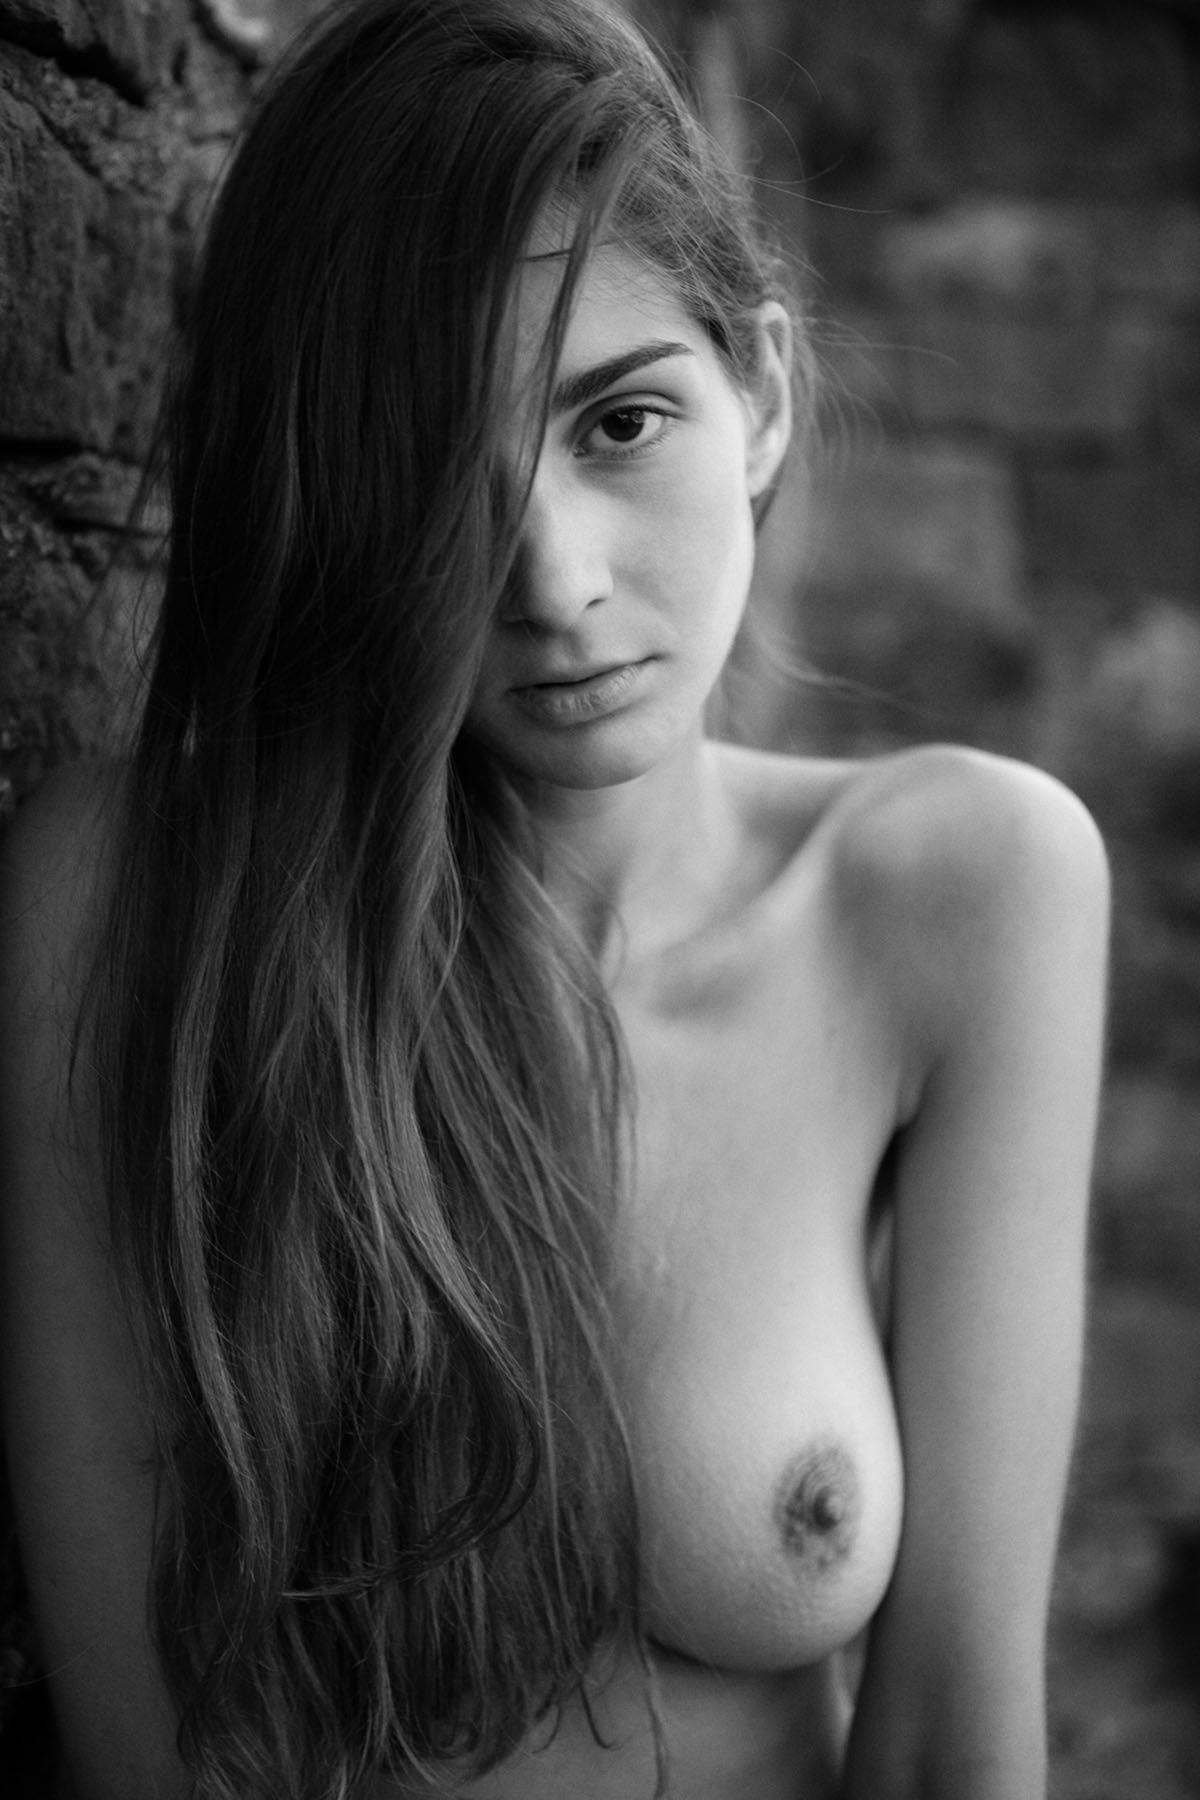 lina naked